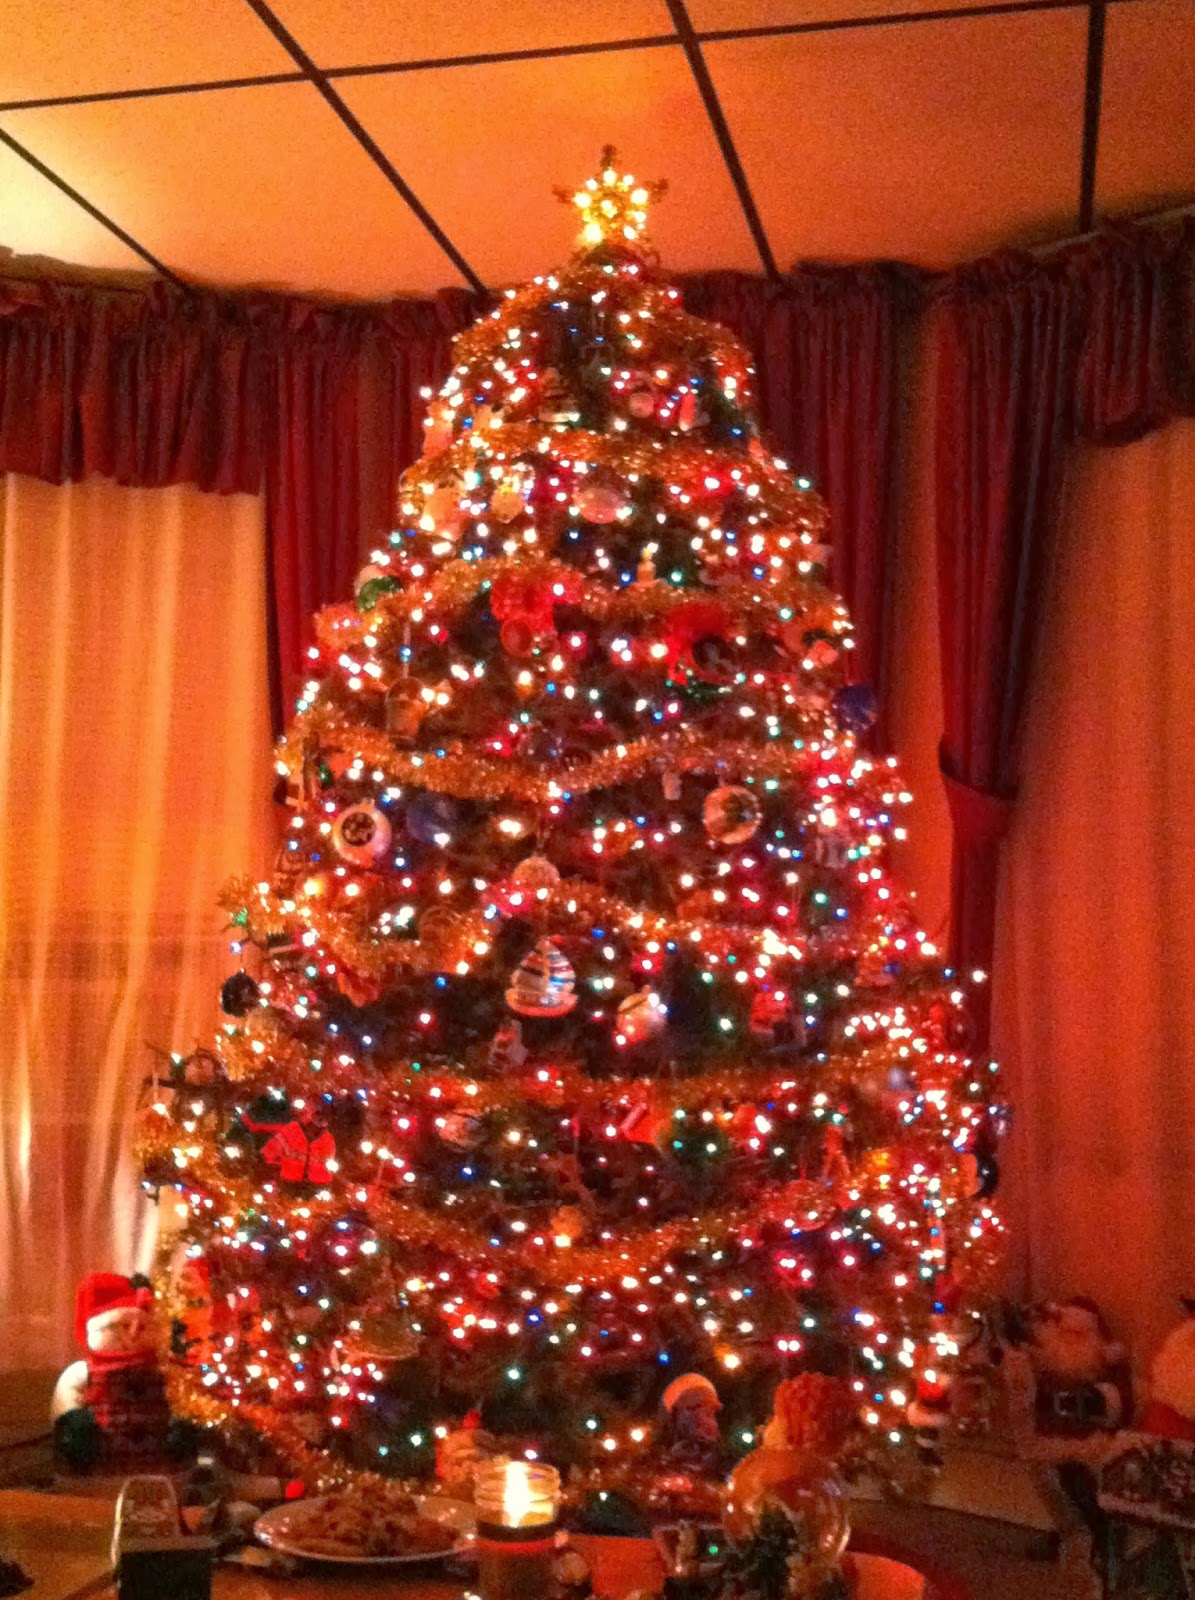 The Holidaze: Holidaze Christmas Ornaments